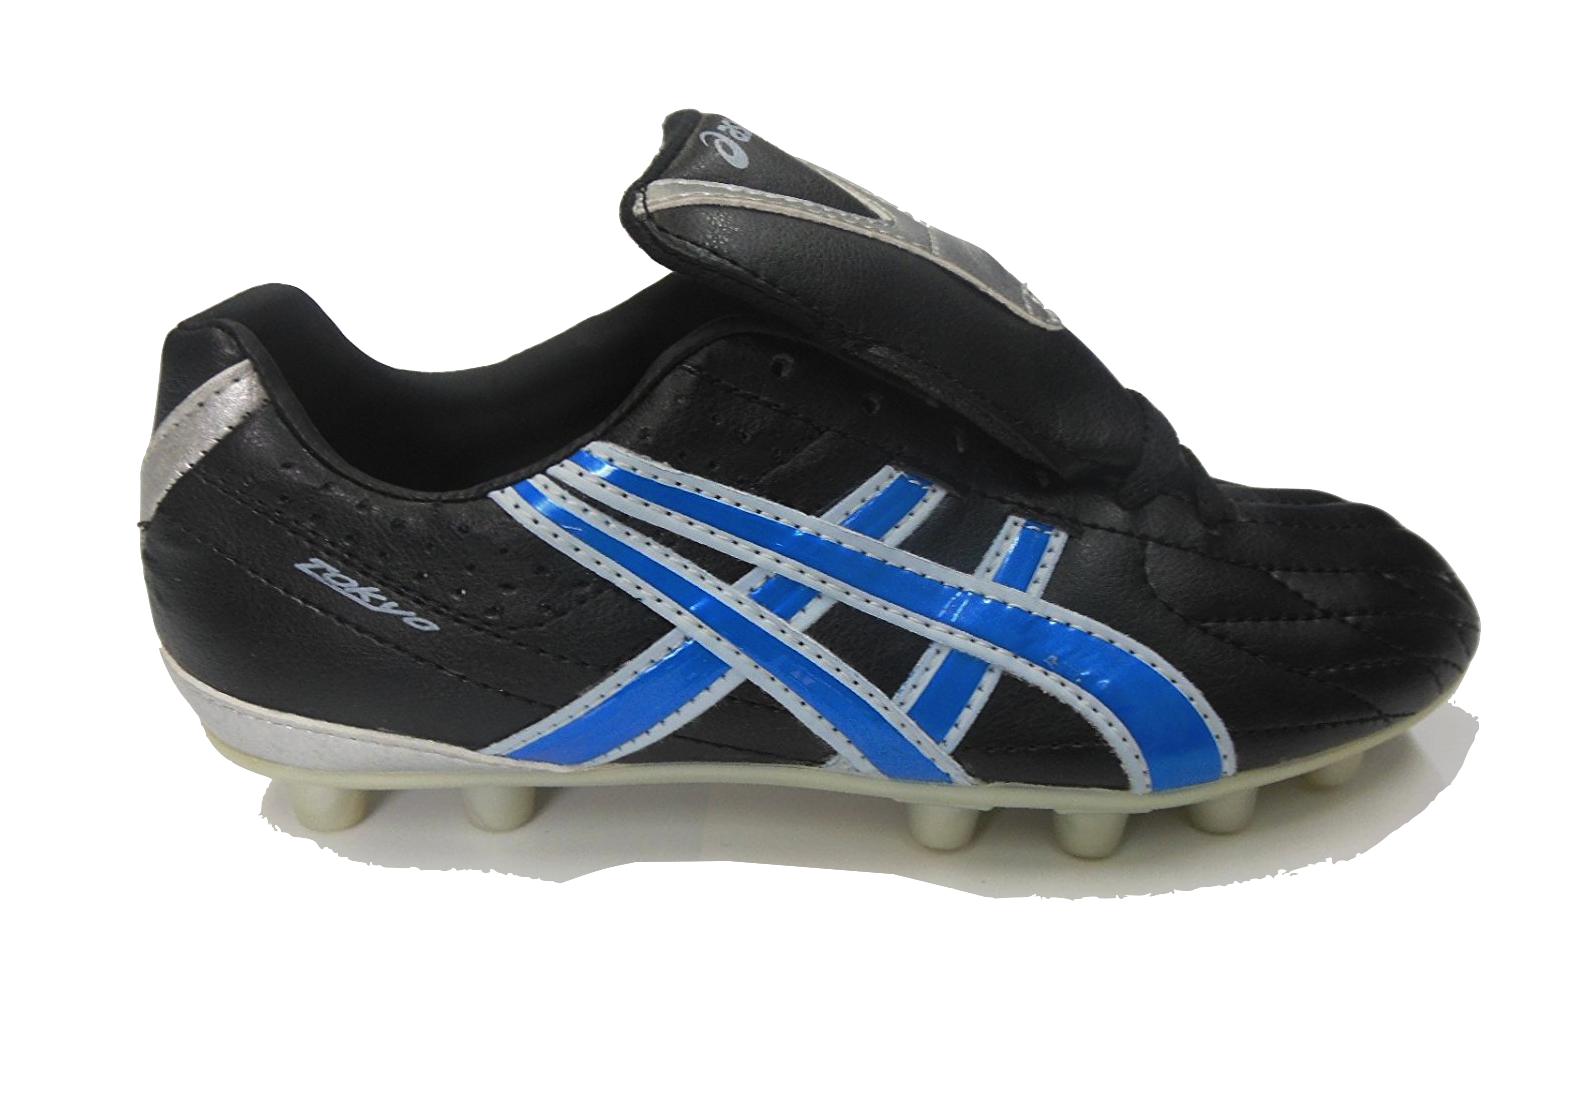 7edc6ed3a44 Asics Tokyo CS Schuhe da Calcio Nera Football Soccer Soccer Soccer Scarpa  Tacchetti Fissi e23026